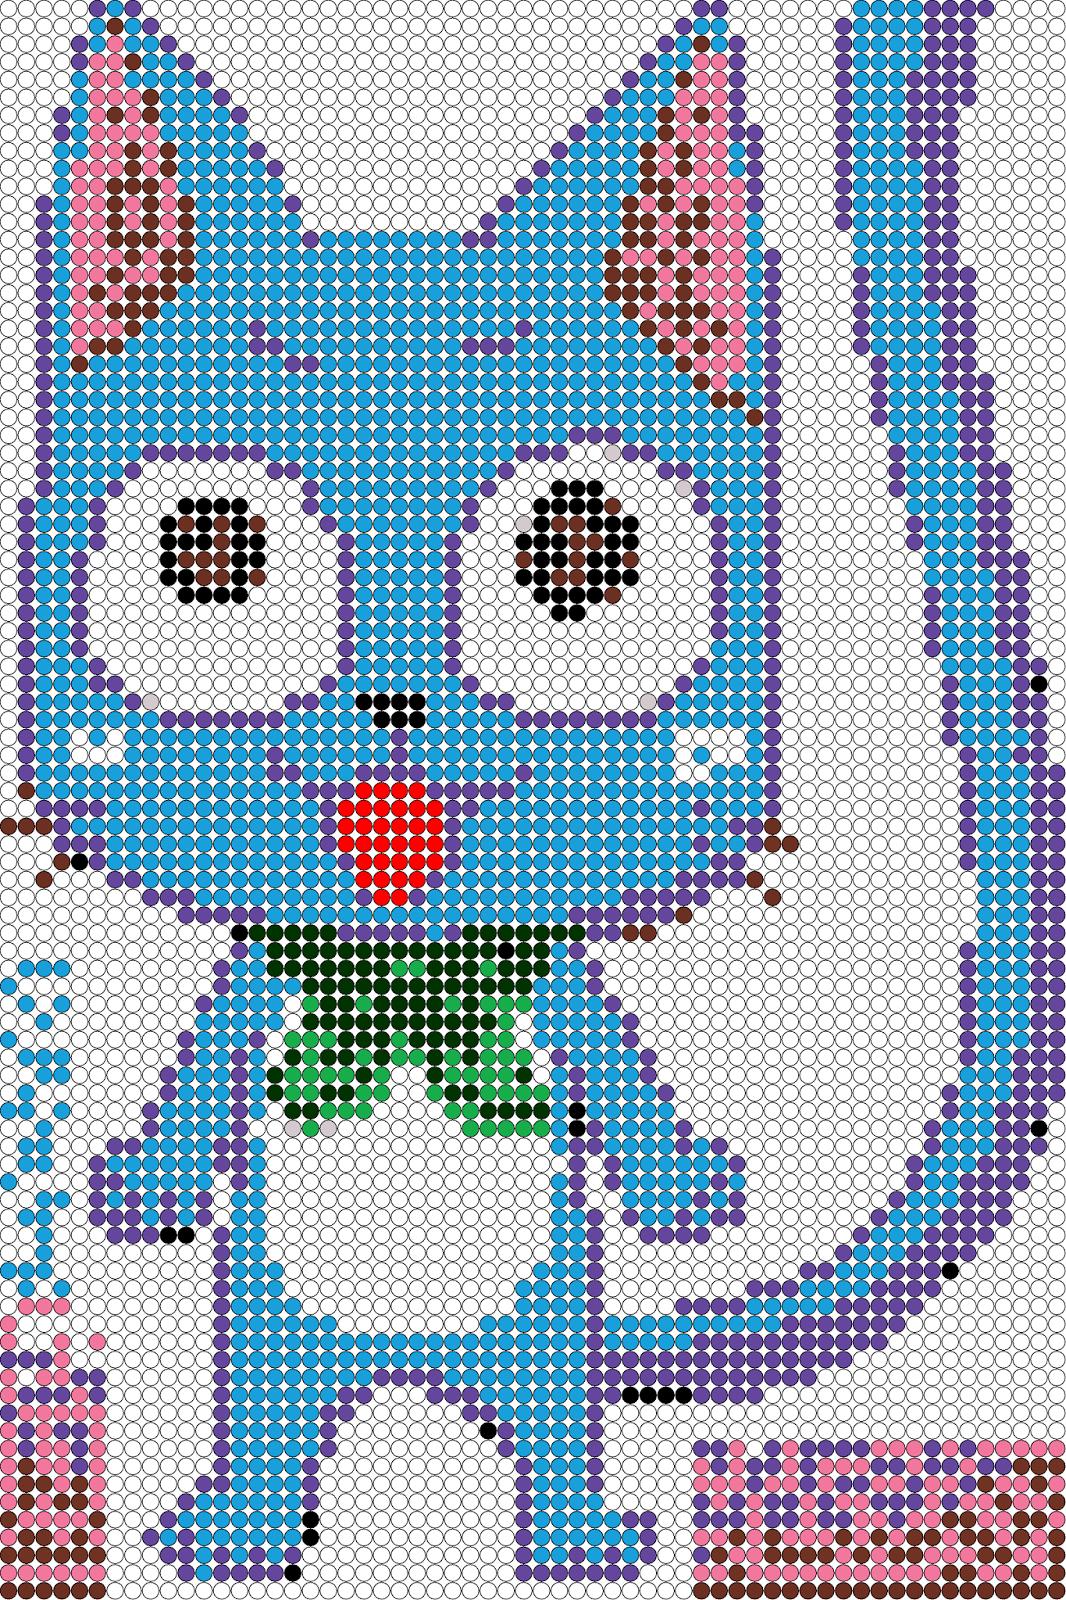 Pixel Art En Perle Hama Manga Dessin Chat Pixel Art Et